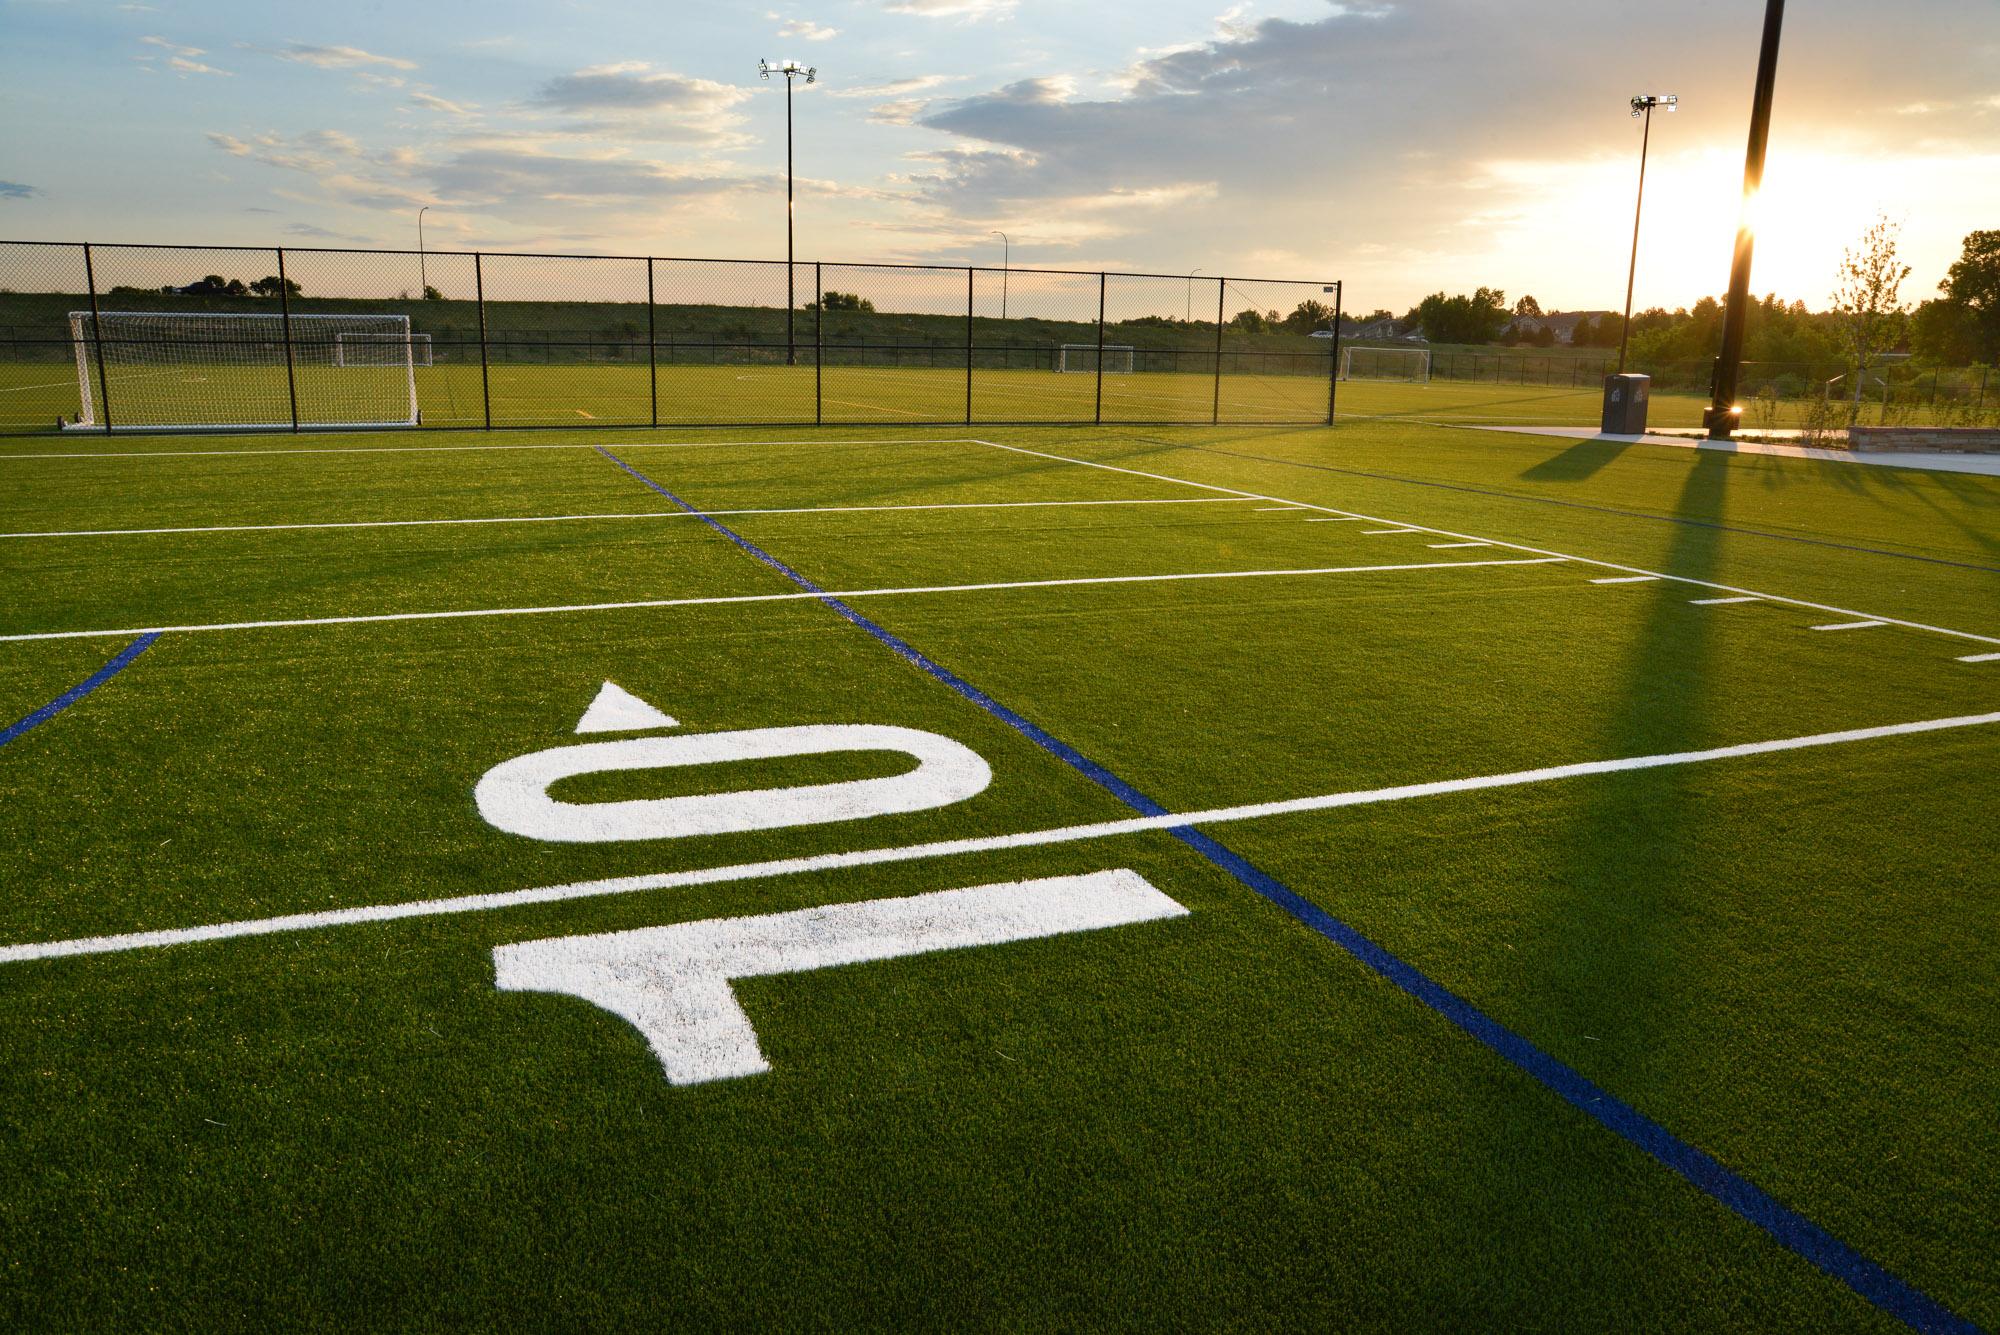 highland-heritage-park-west-fields-synthetic-turf-football-field.jpg